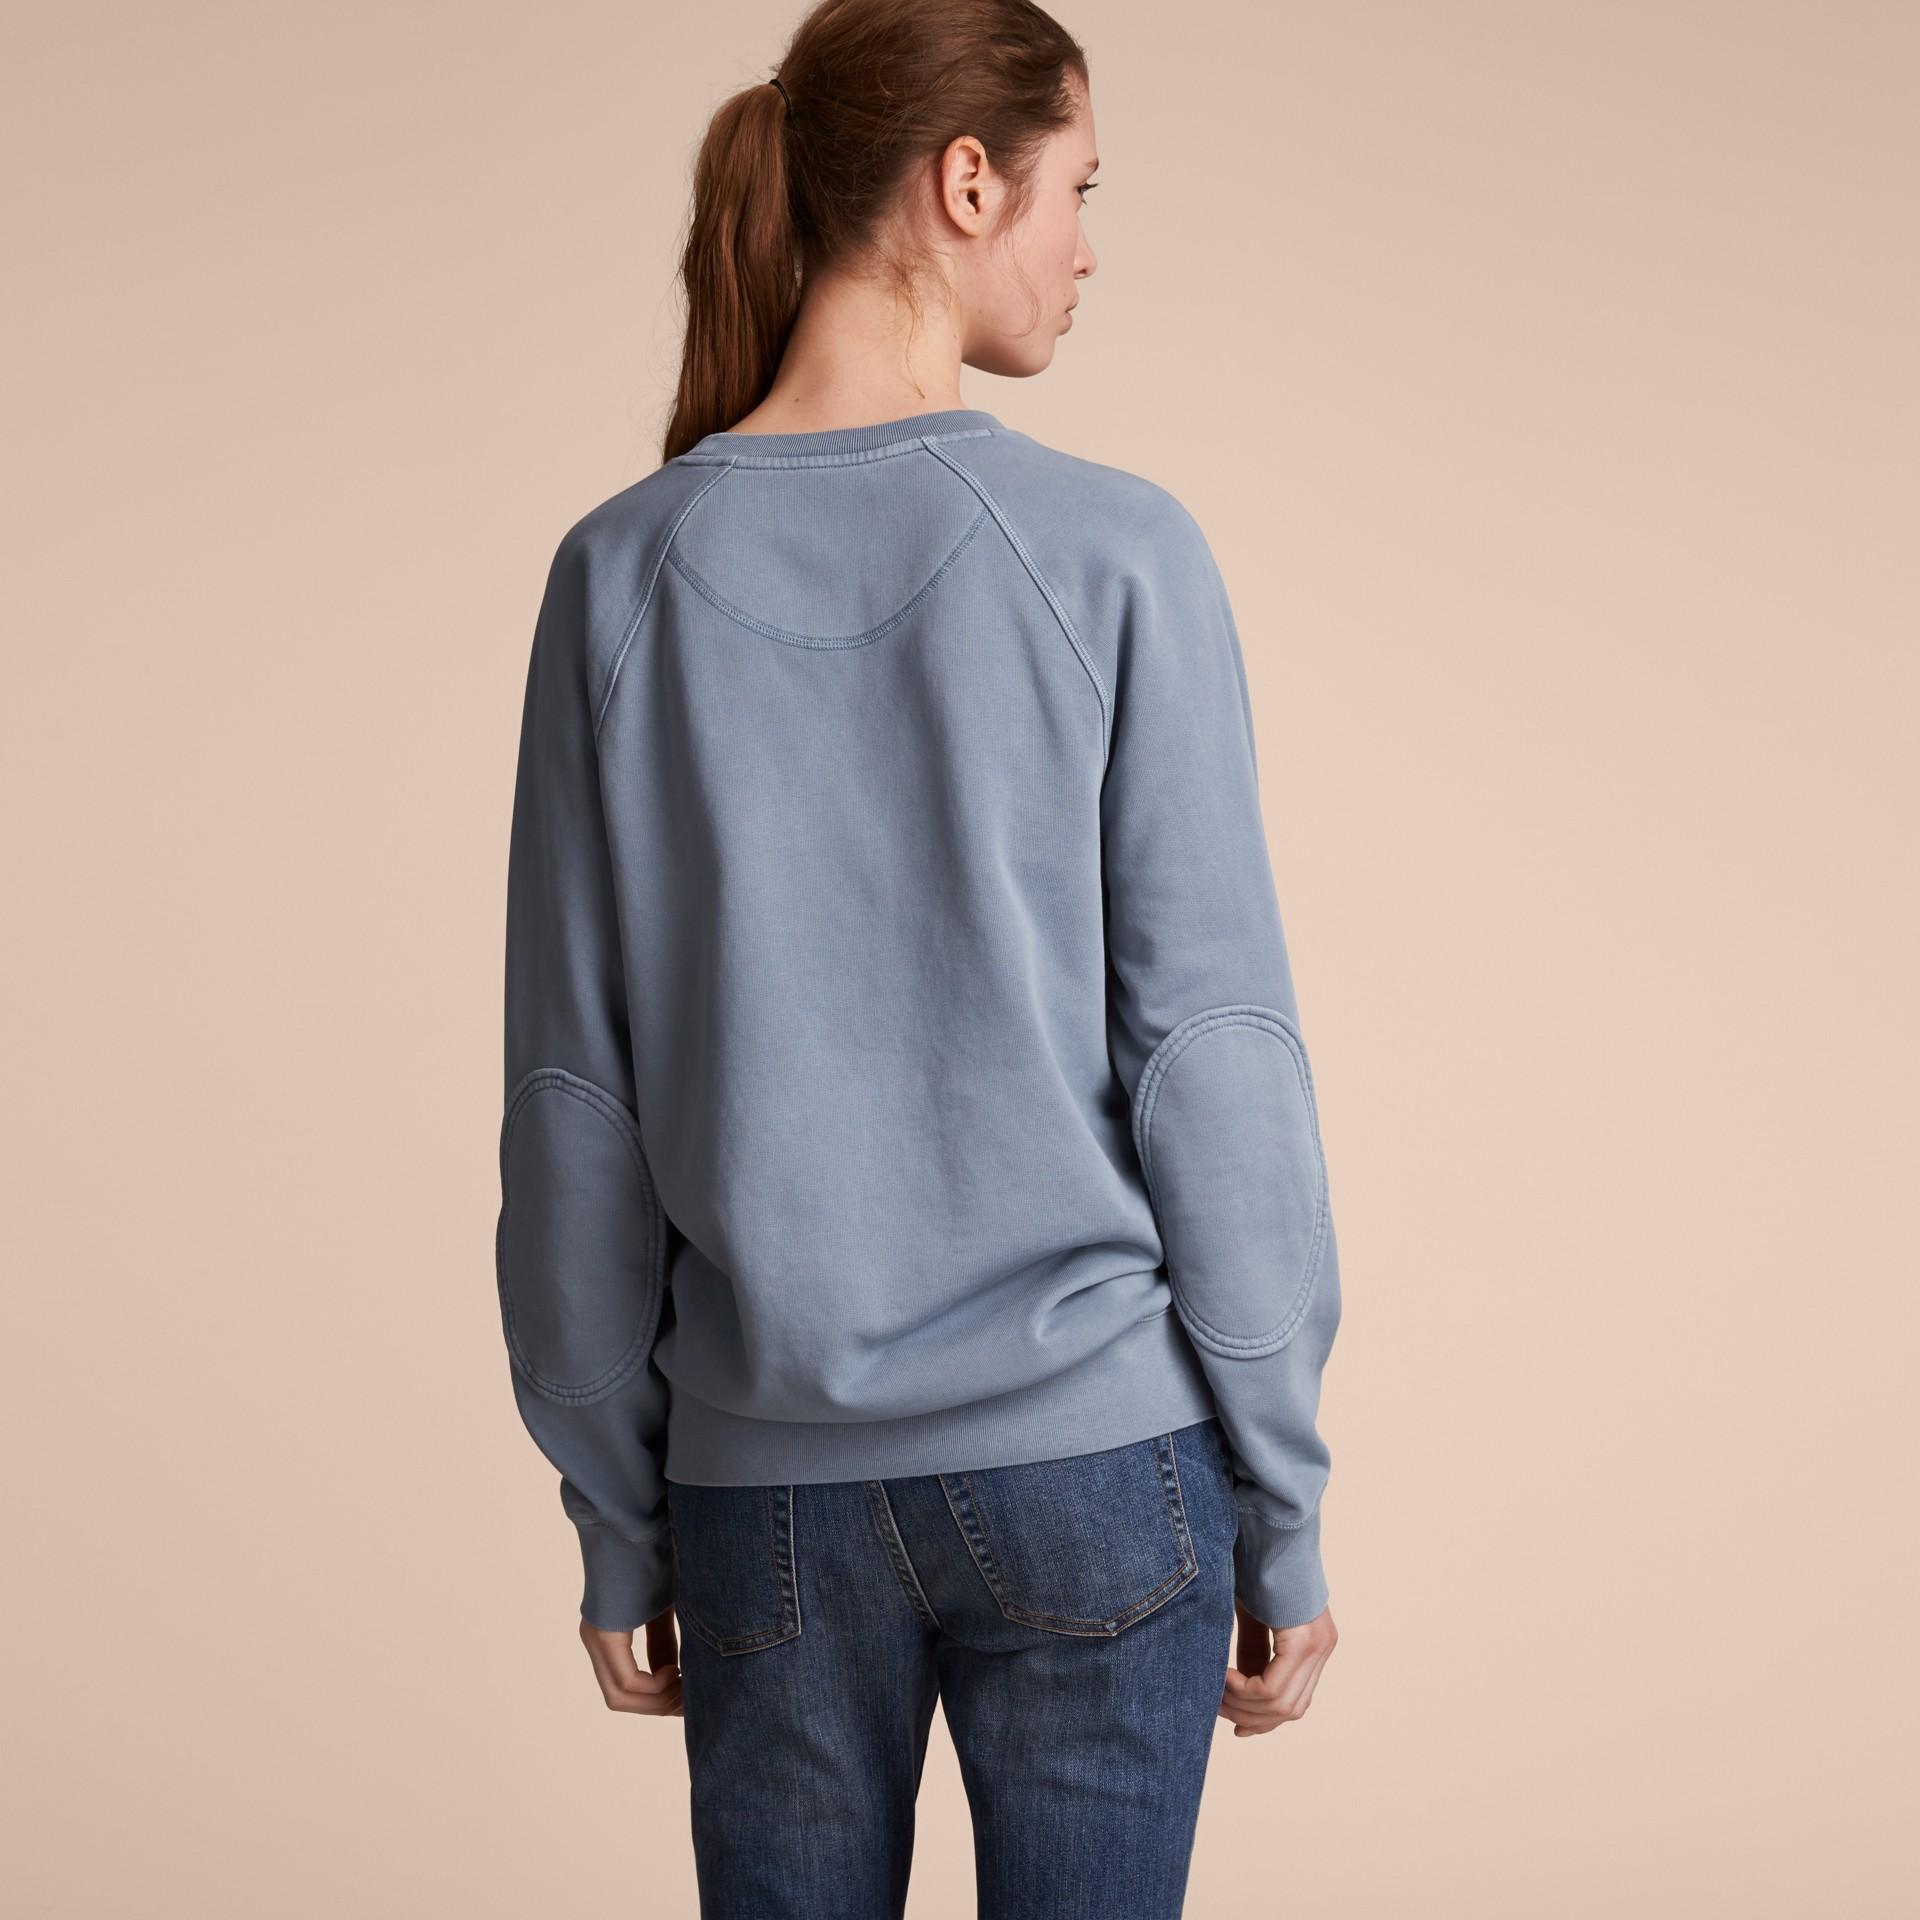 Unisex Pigment-dyed Cotton Oversize Sweatshirt - gallery image 3